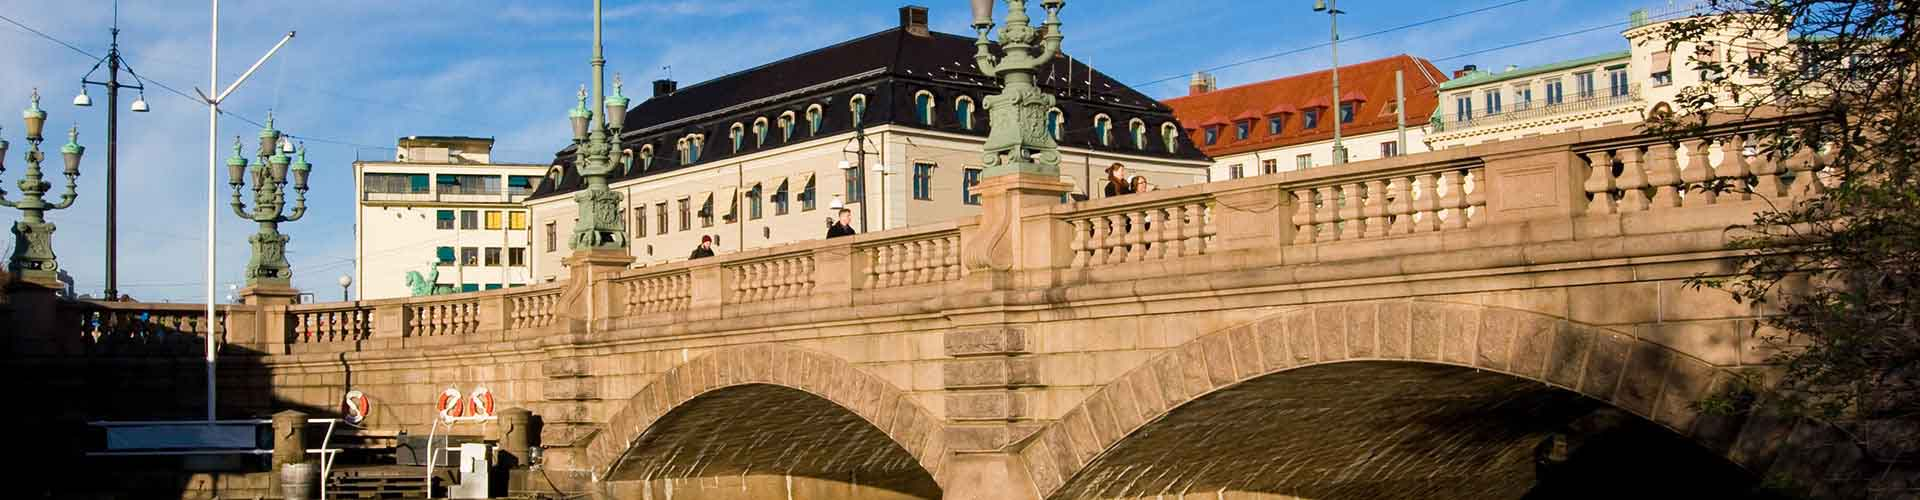 Gotemburgo - Hostales en Gotemburgo. Mapas de Gotemburgo, Fotos y comentarios de cada Hostal en Gotemburgo.